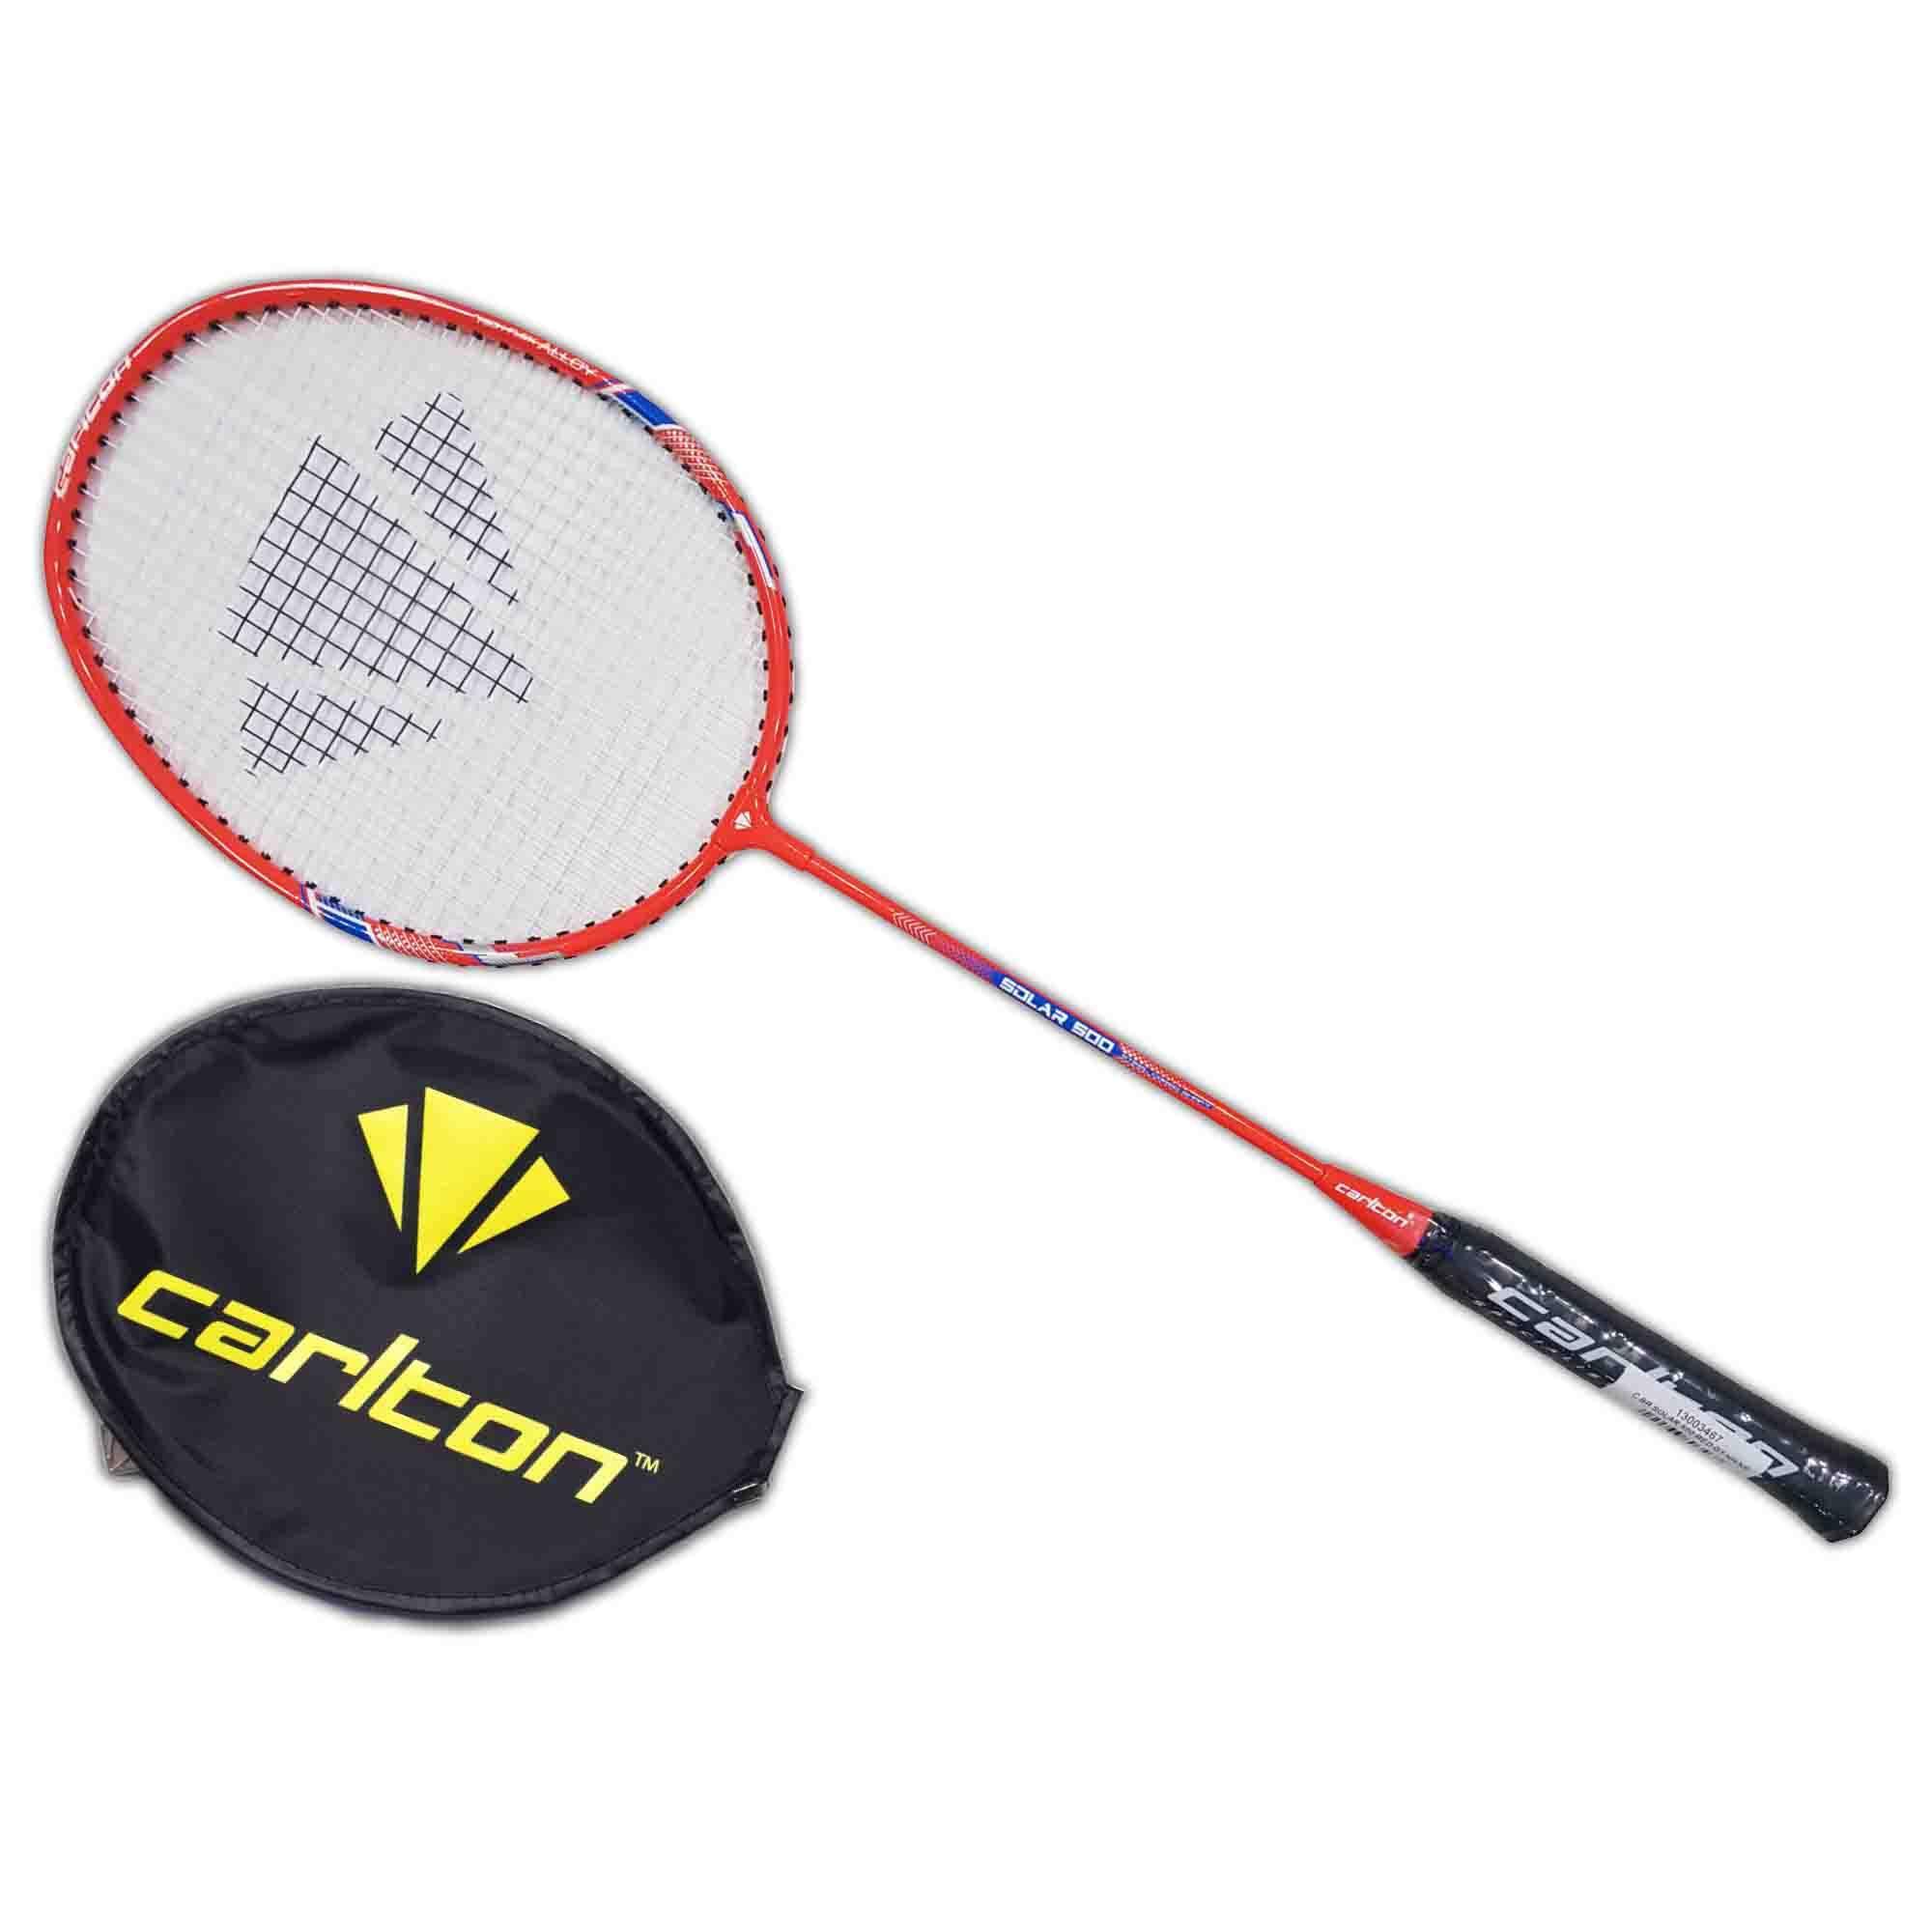 Carlton Badminton Racket Solar 500